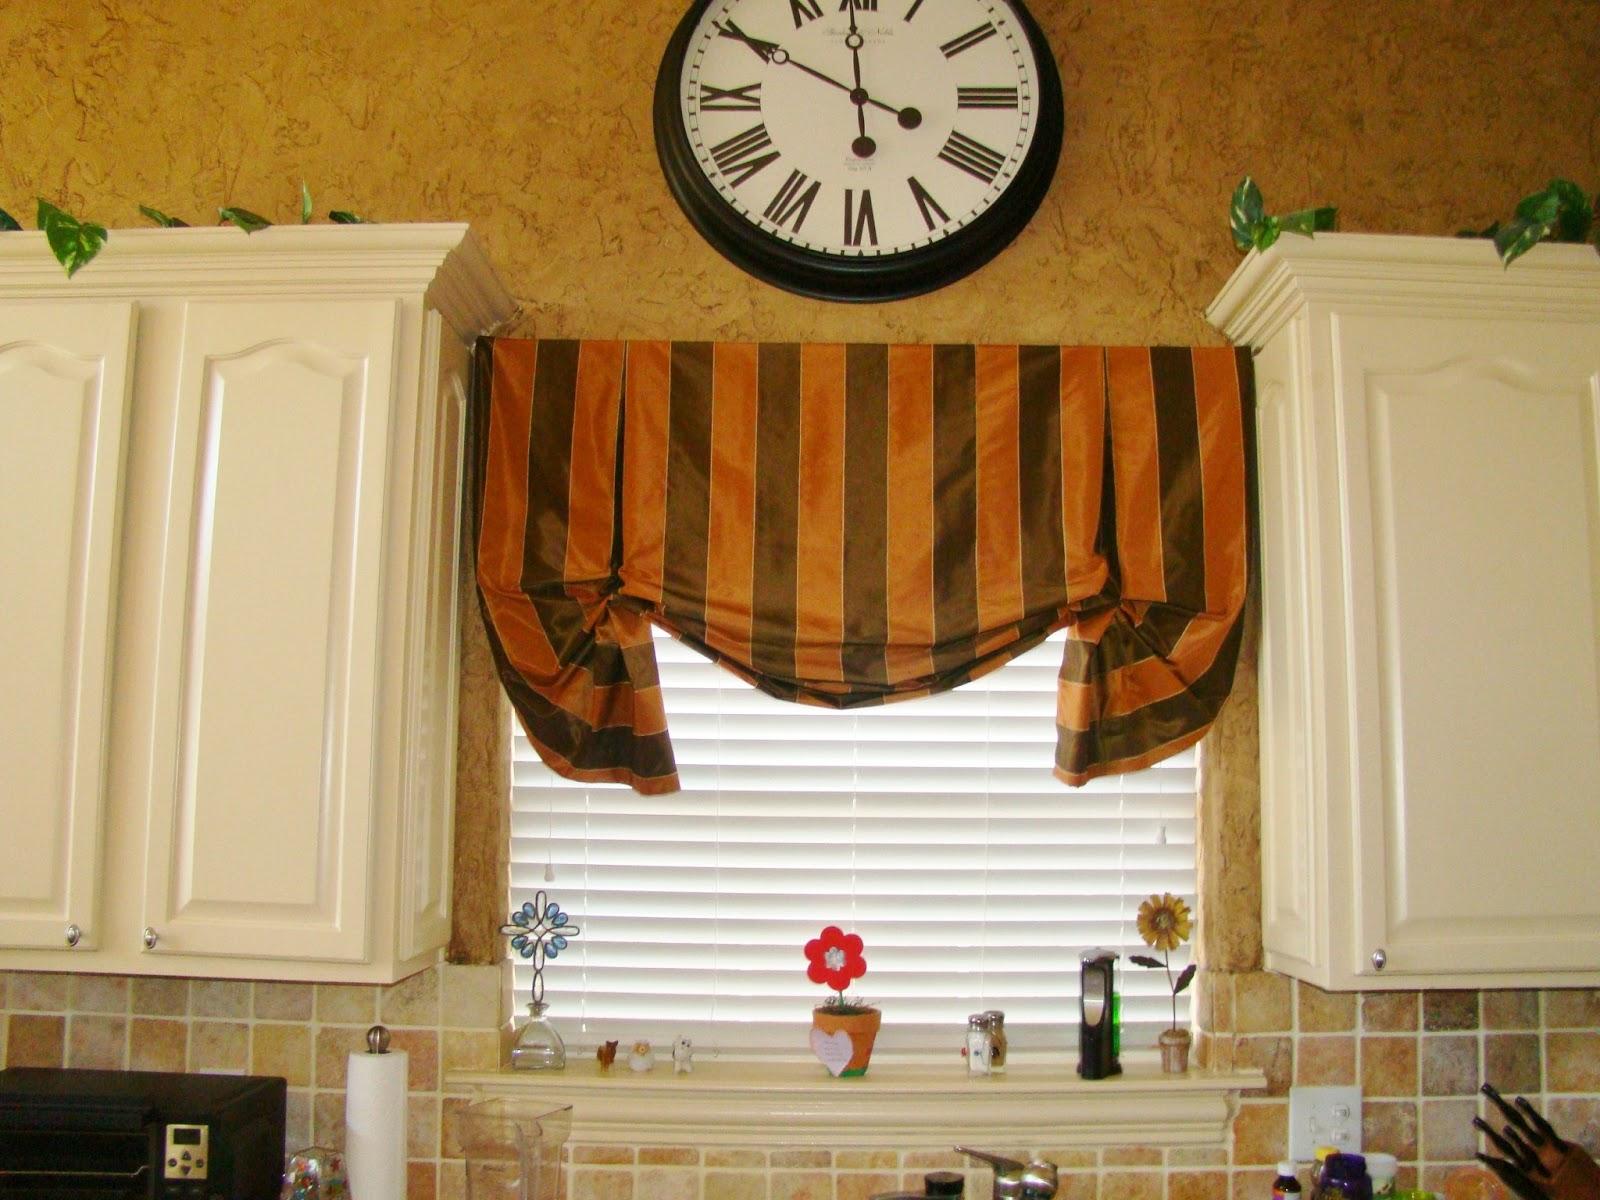 Avenue window fashions custom window treatments in for Window fashions of texas